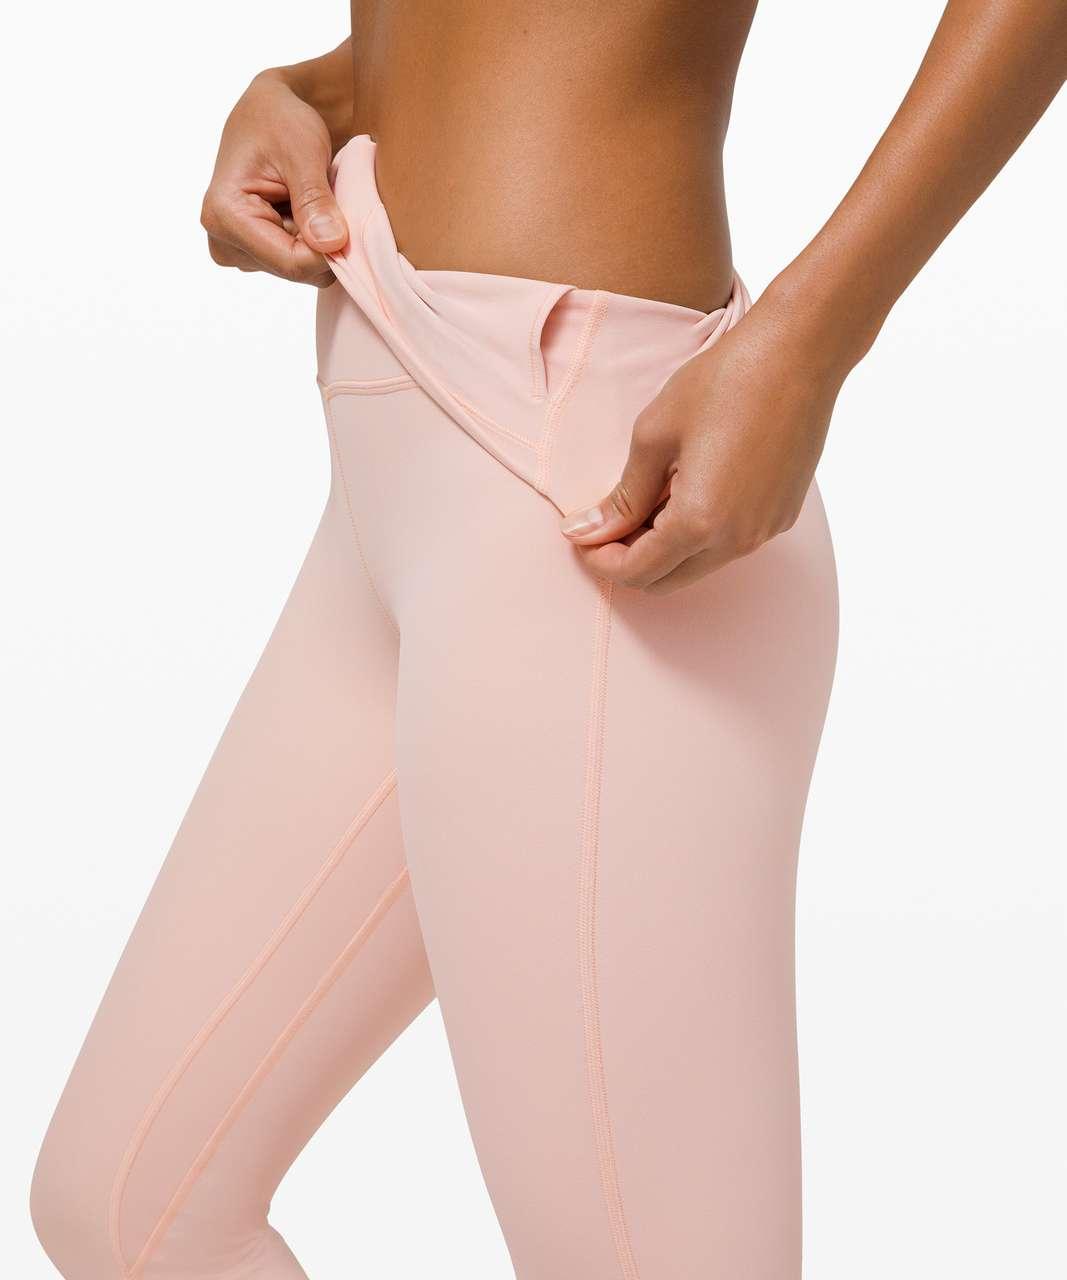 "Lululemon Align Pant II 25"" - Feather Pink"